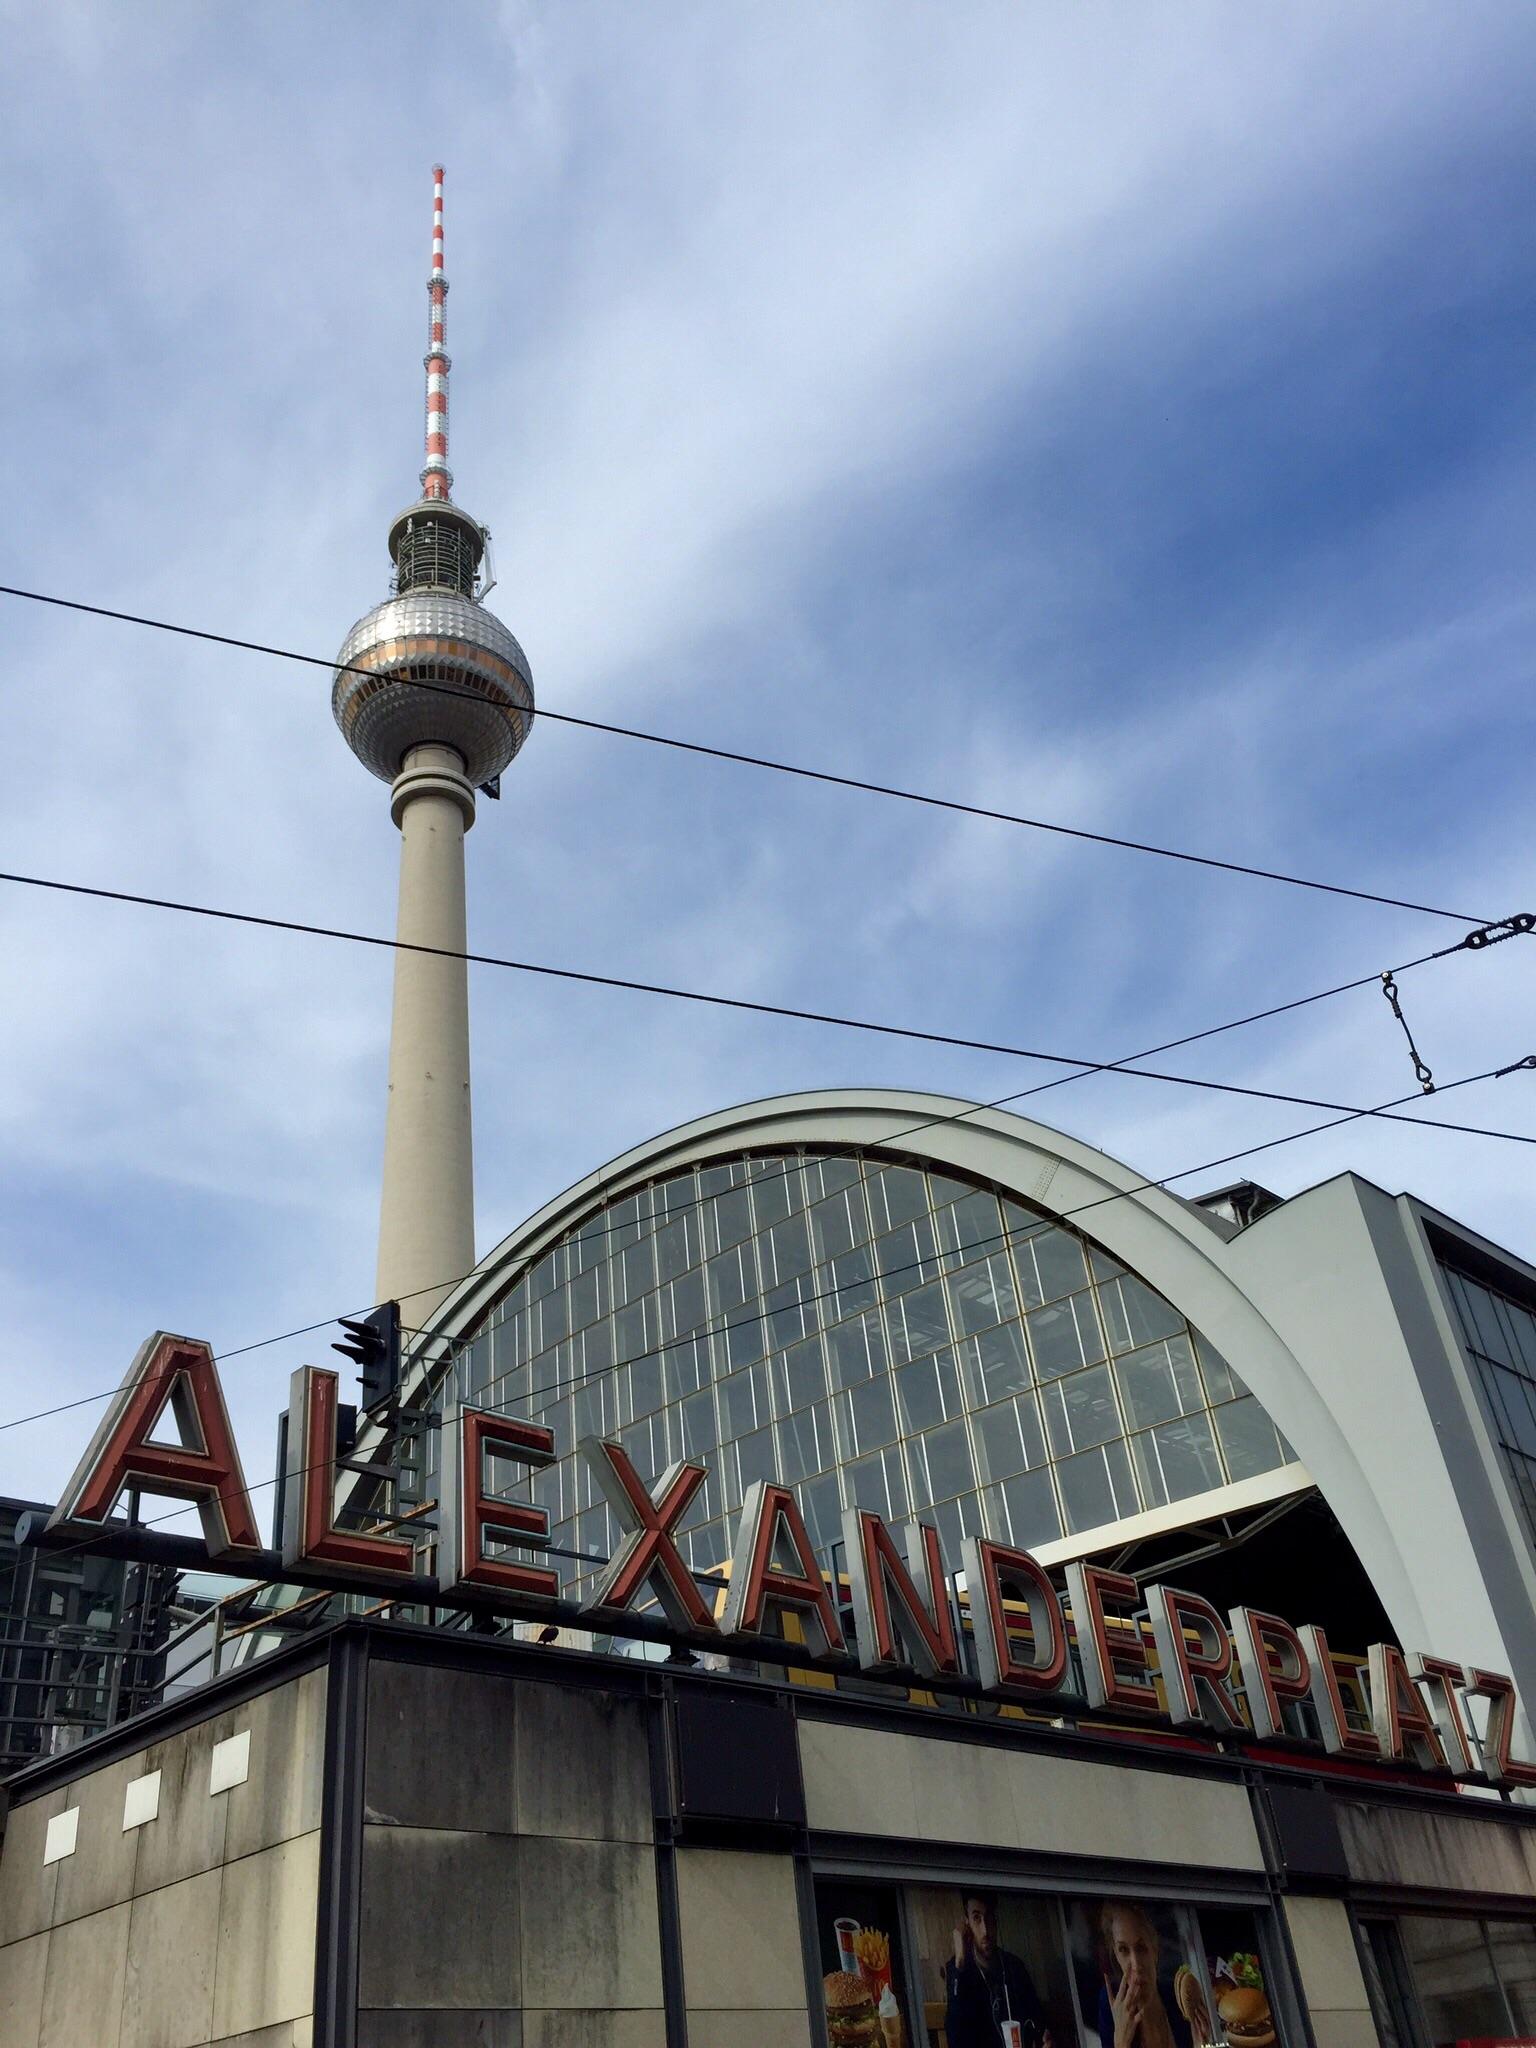 The TV Tower at Alexanderplatz.